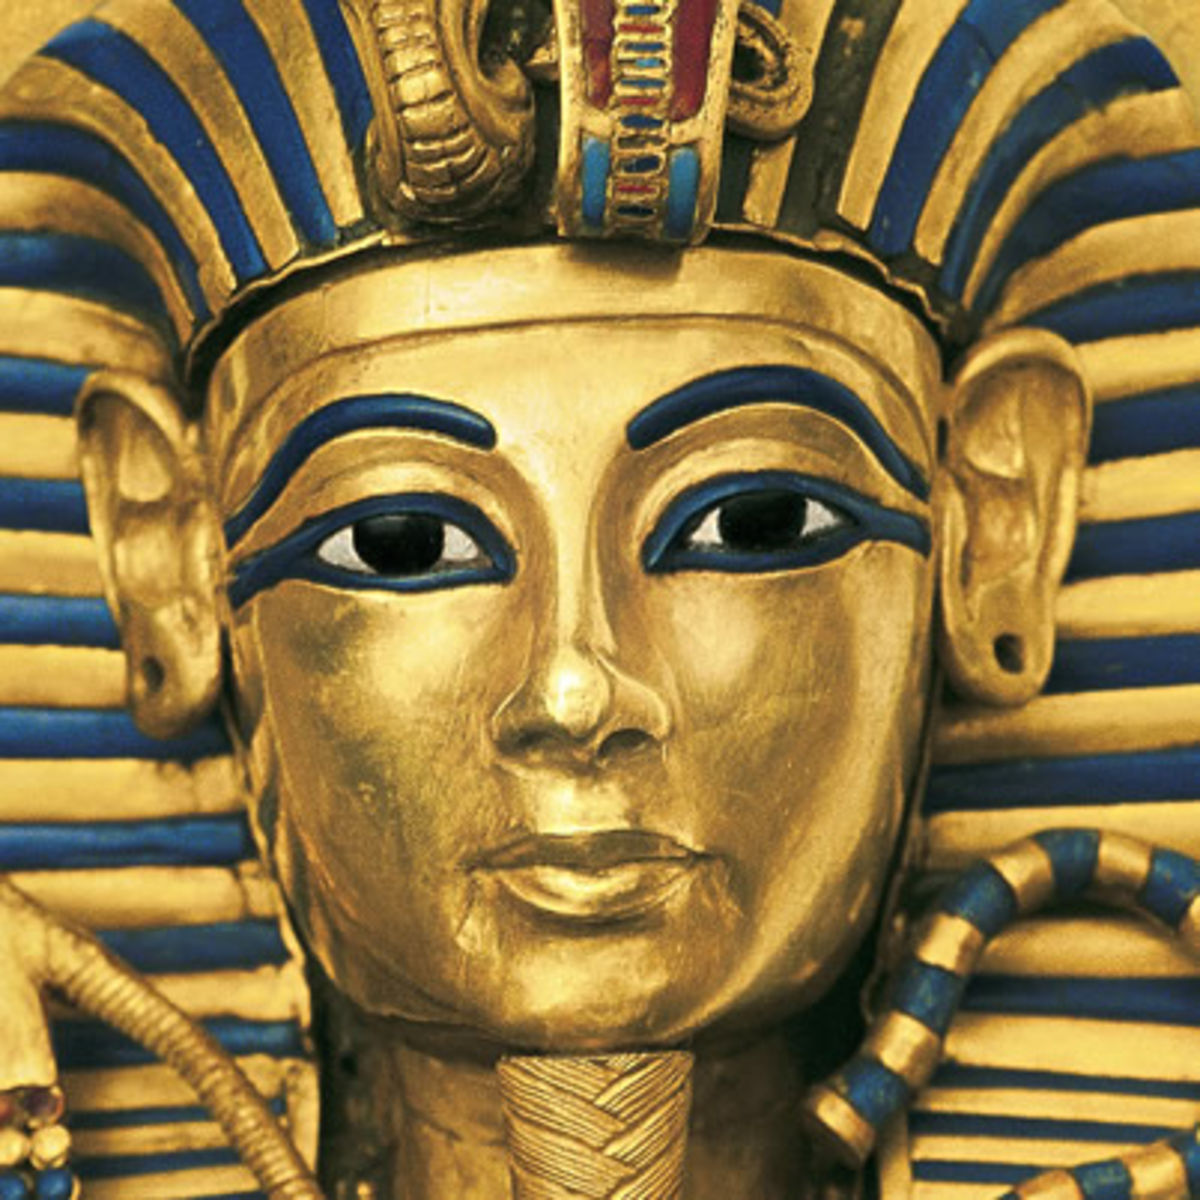 1200x1200 Tutankhamun Know Your Meme